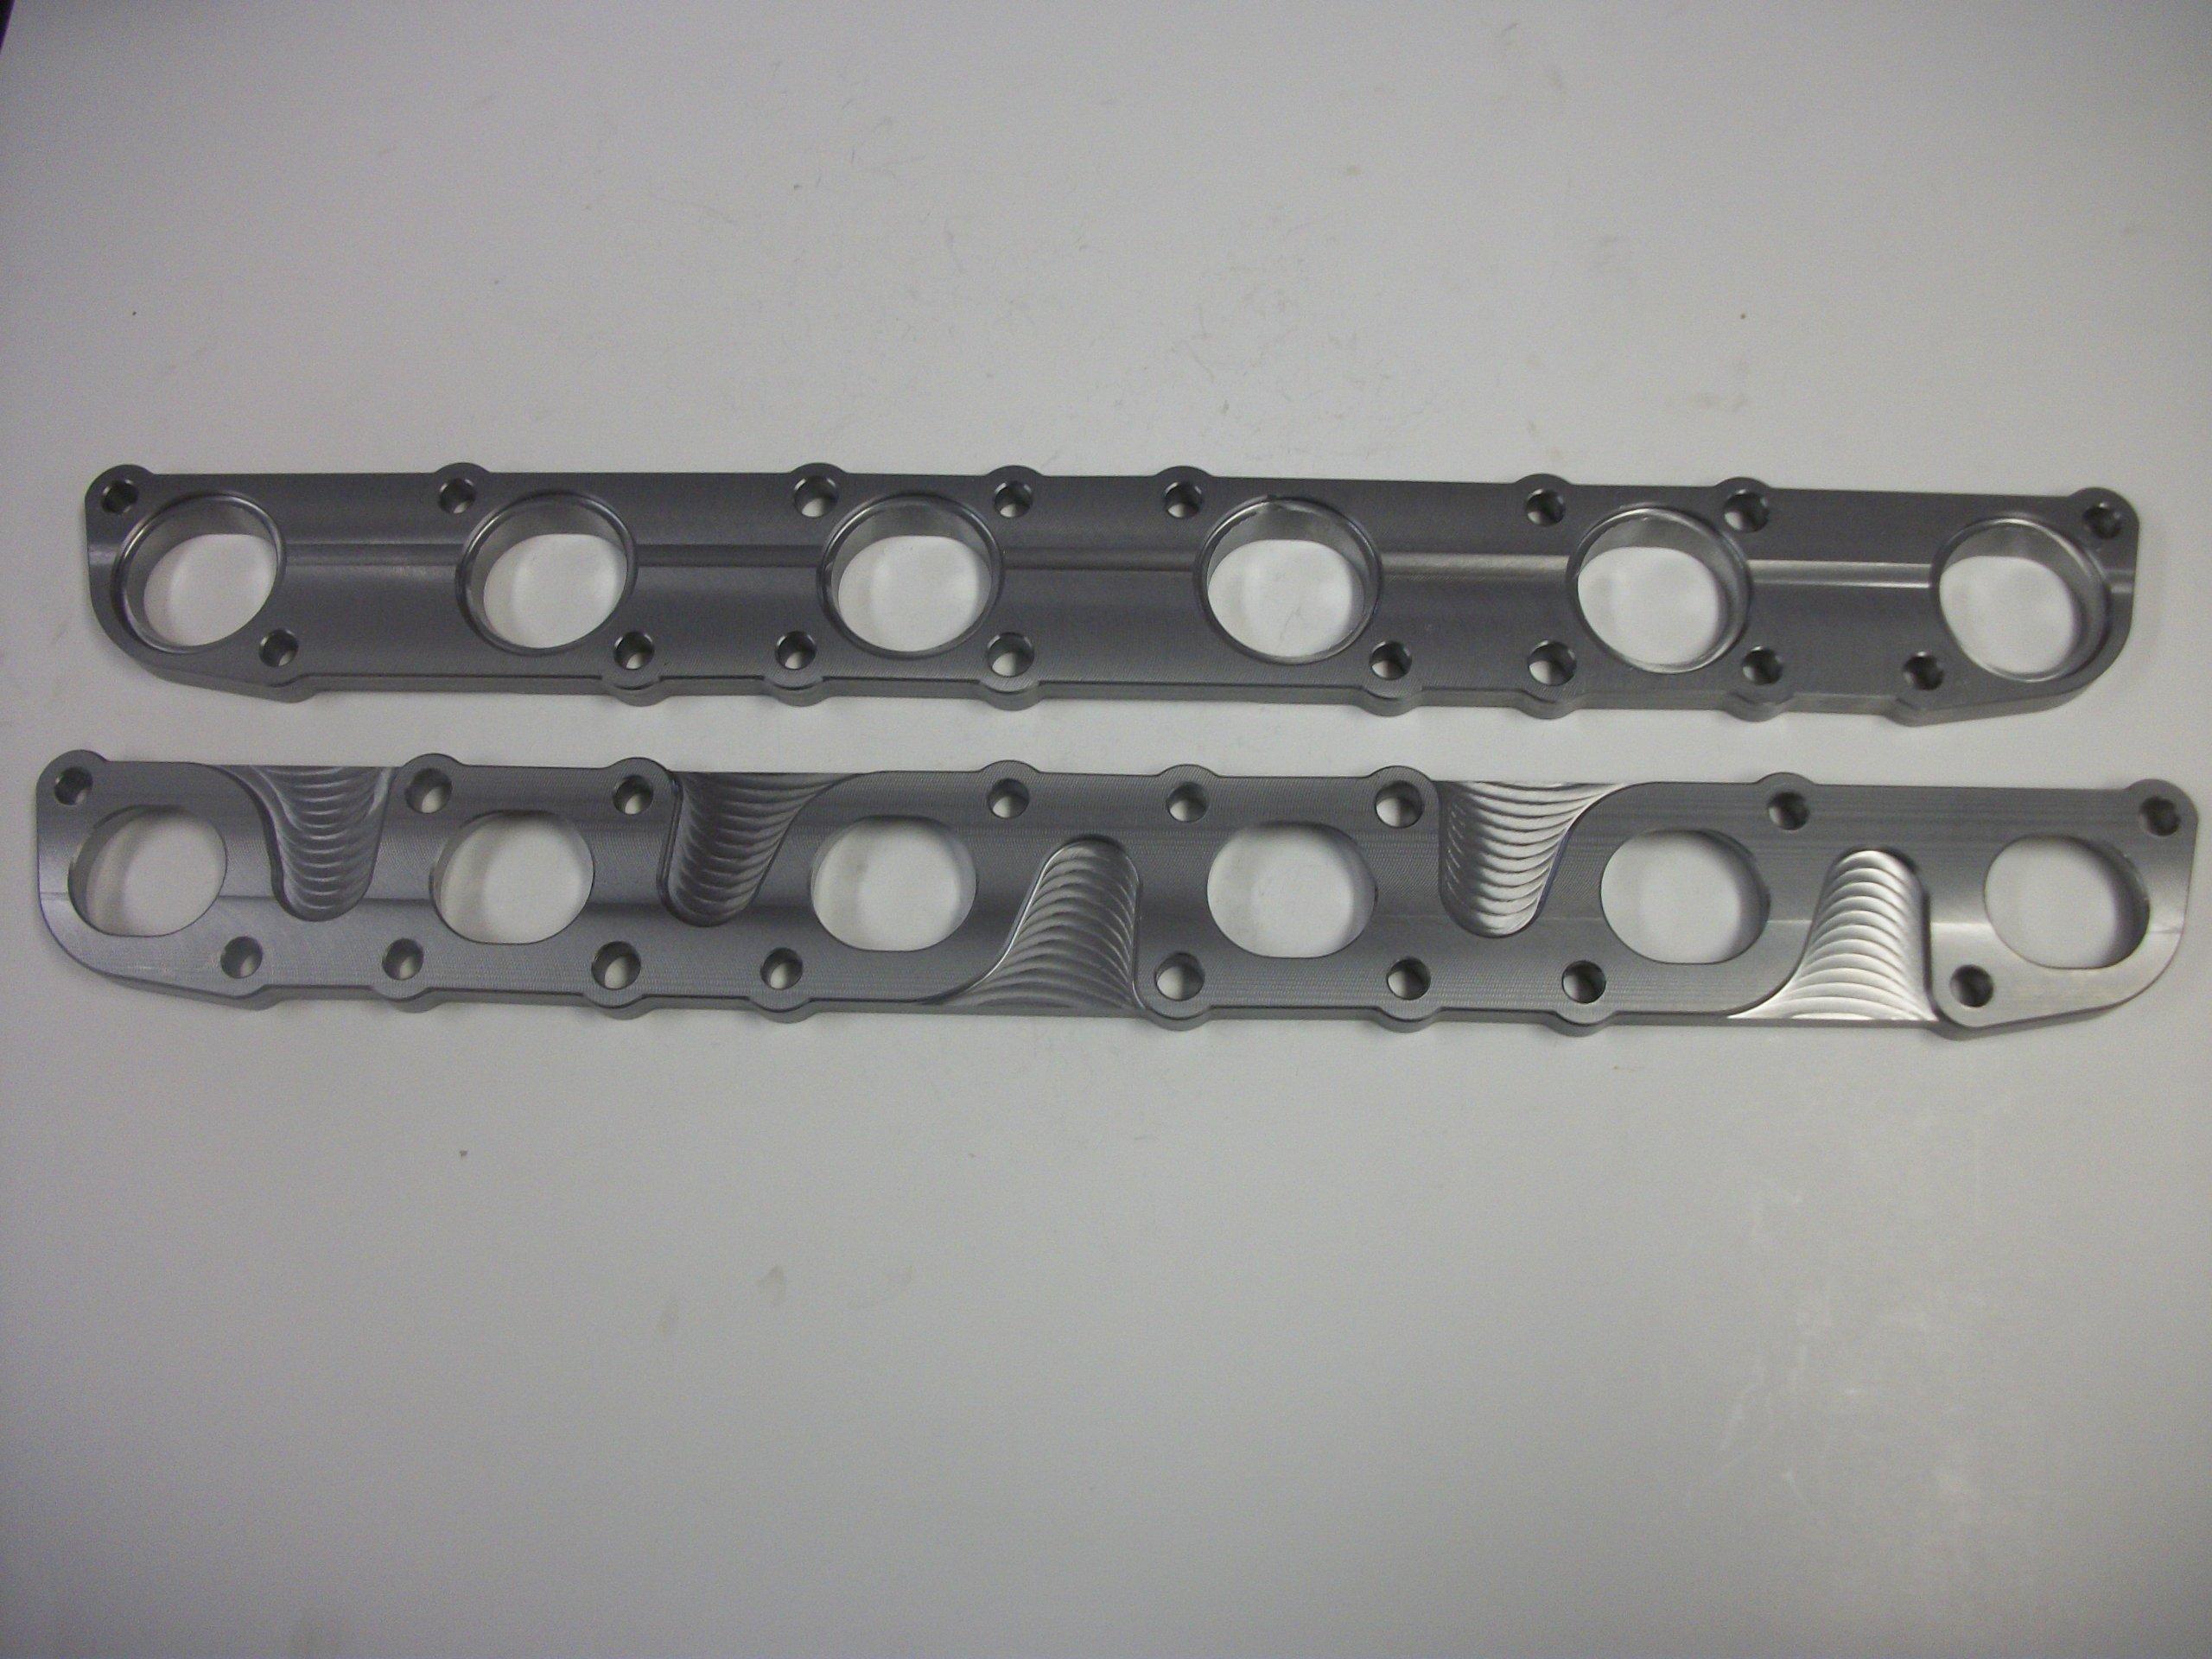 FID-Turbo Nissan RB26DETT Exhaust Head Flange - Mild Steel